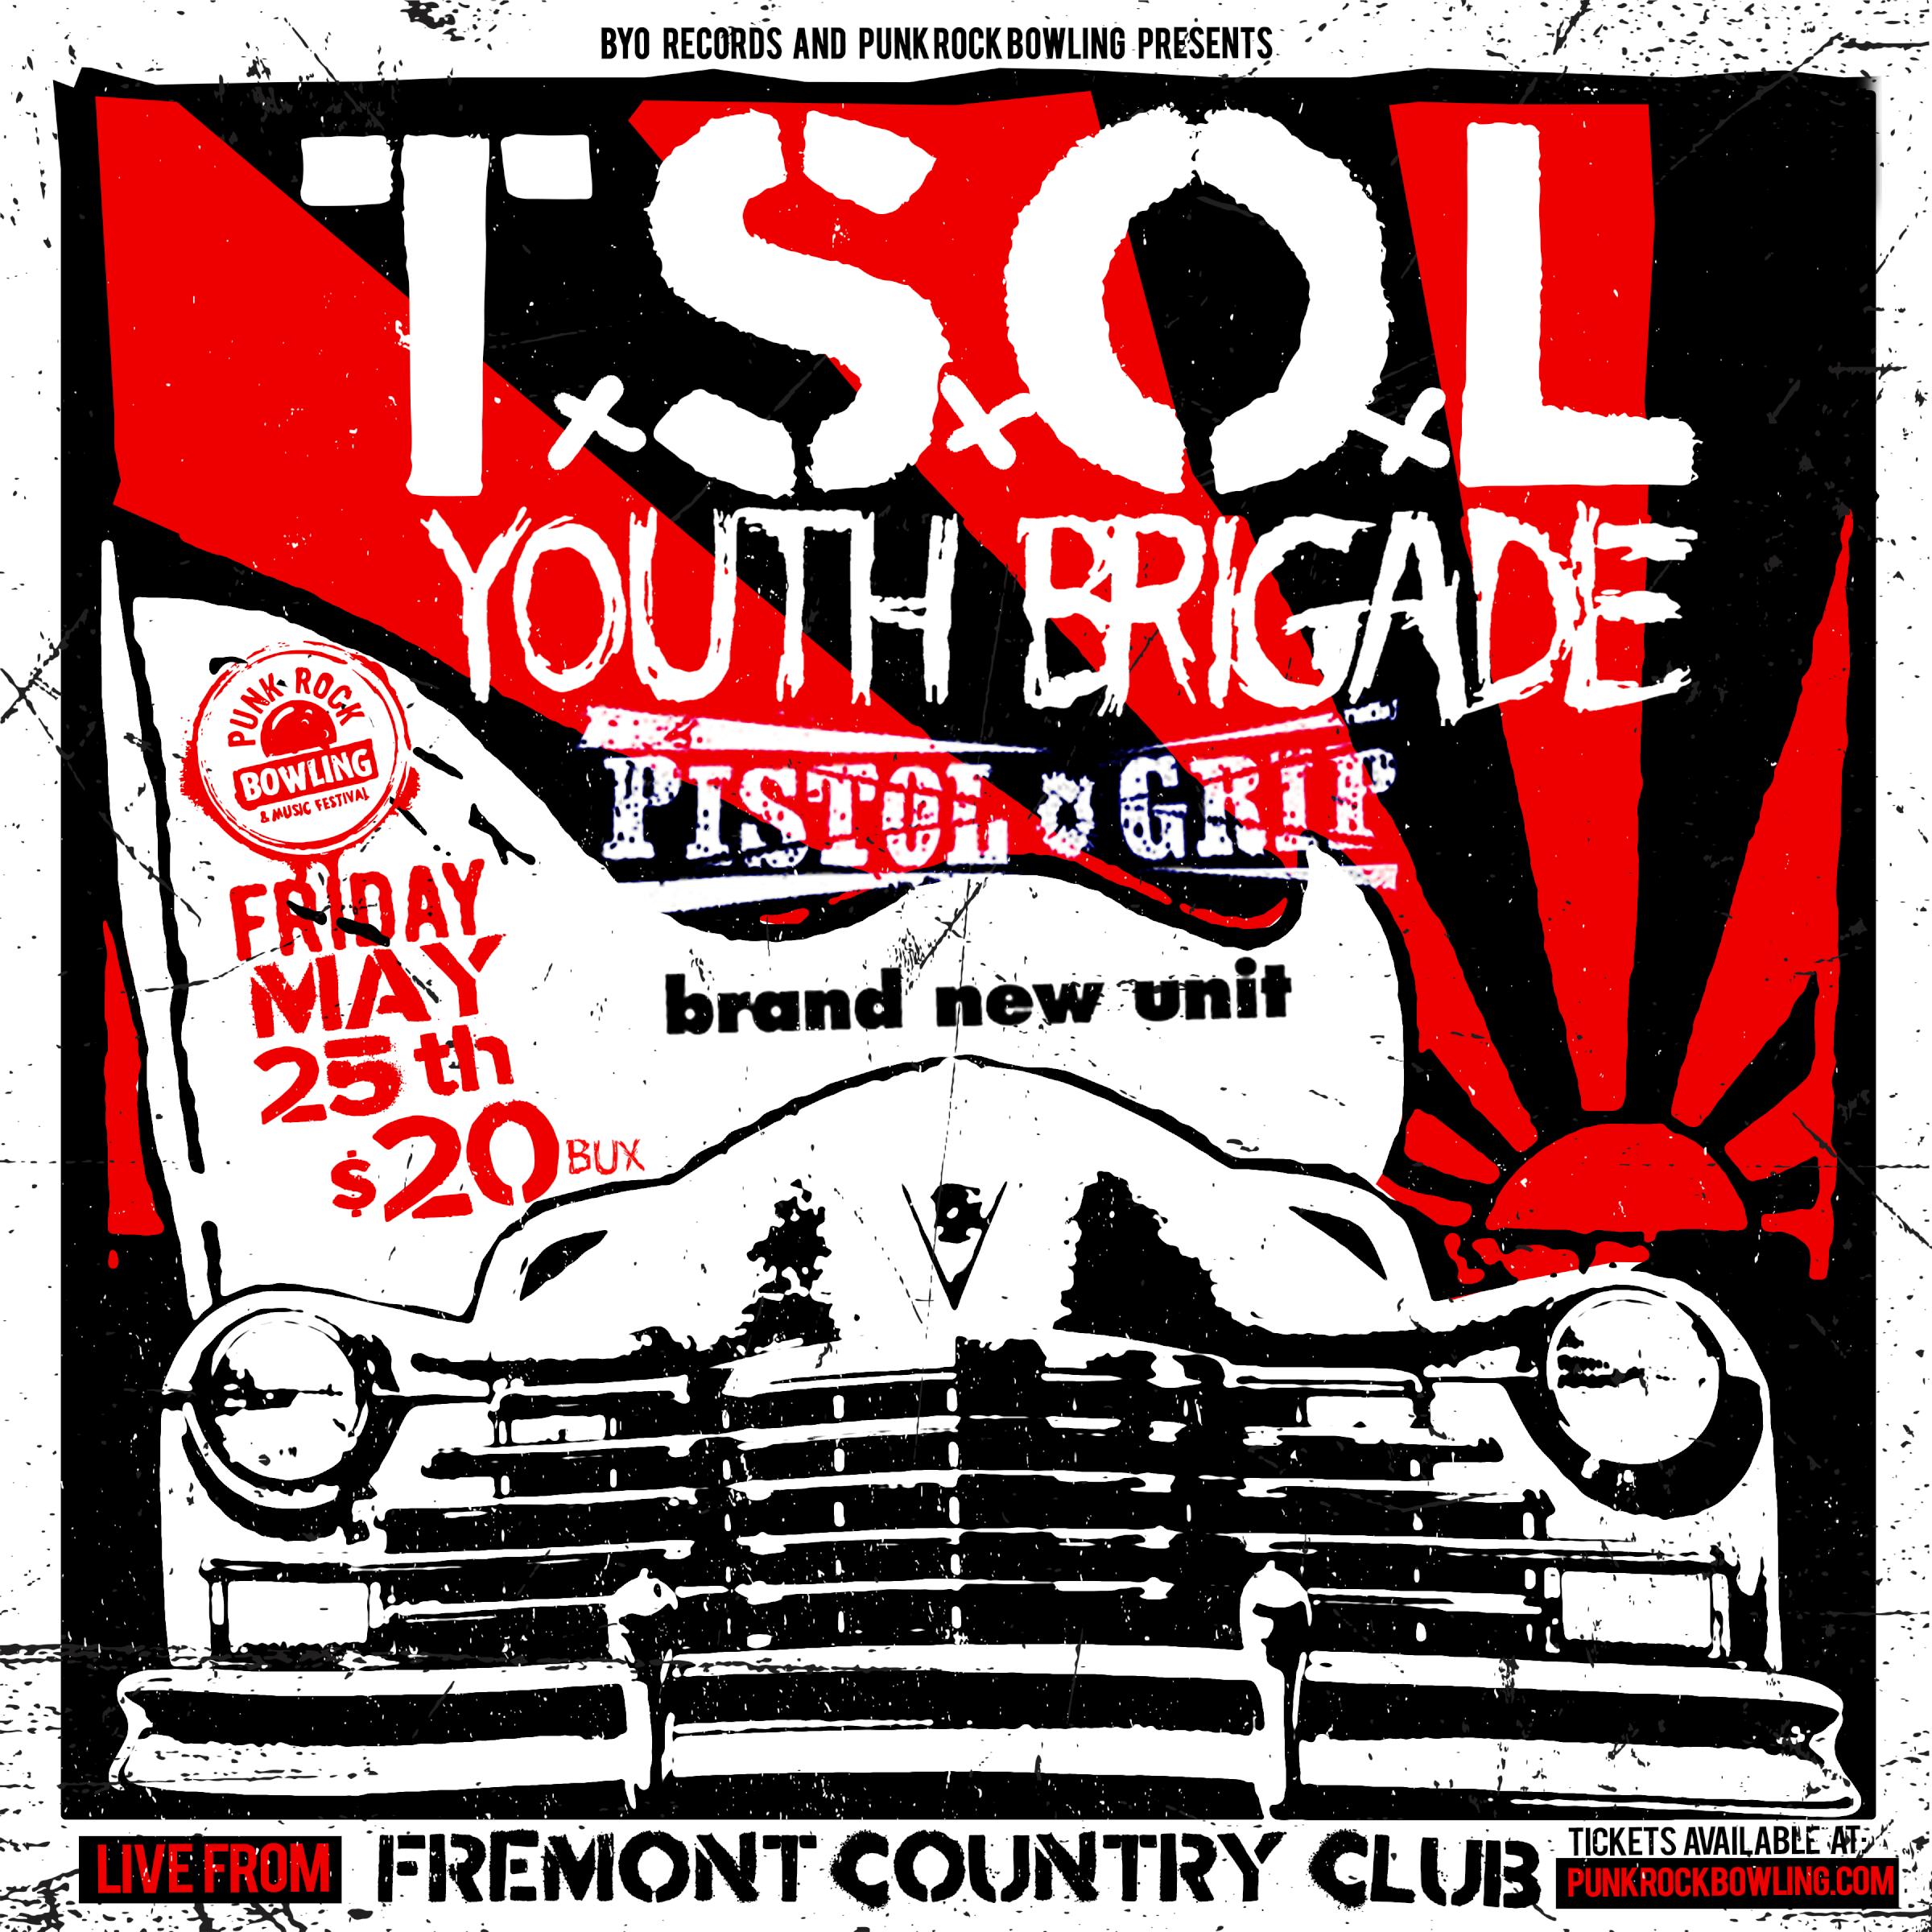 TSOL Youth Brigade Pistol Grip Brand New Unit Punk Rock Bowling 2018